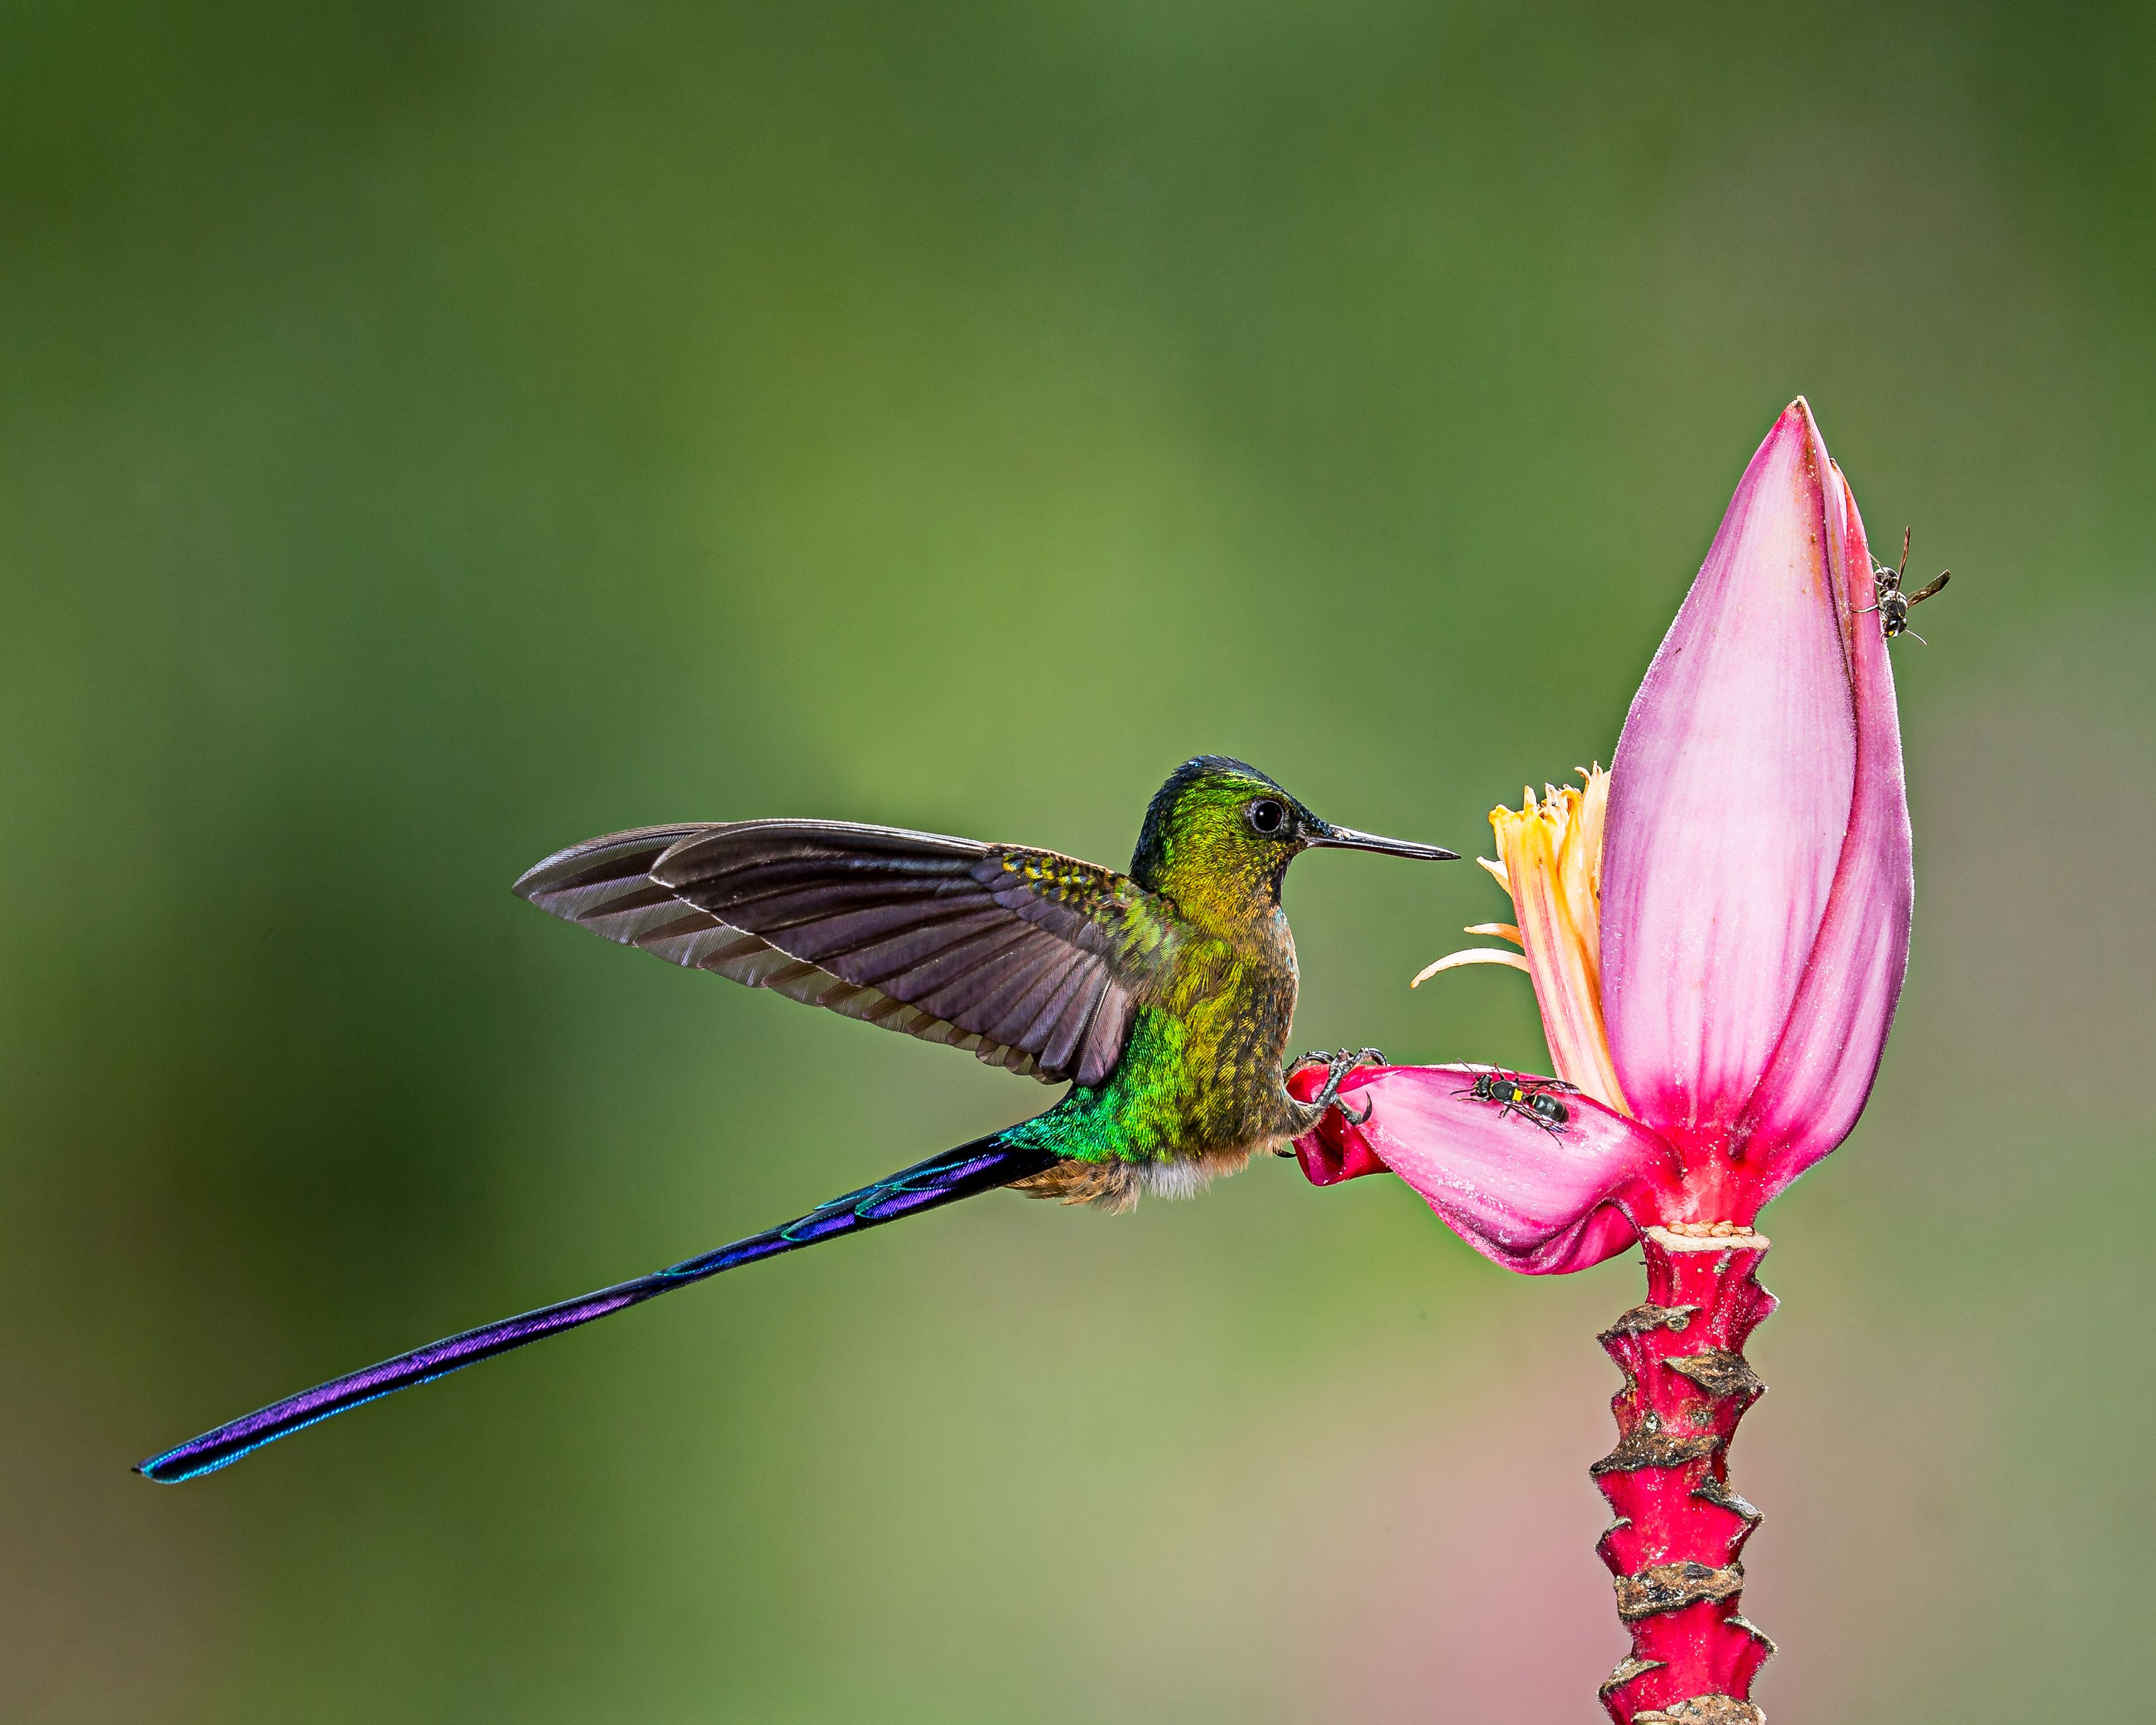 pin by Ольга Минаева on птички pinterest birds hummingbird and